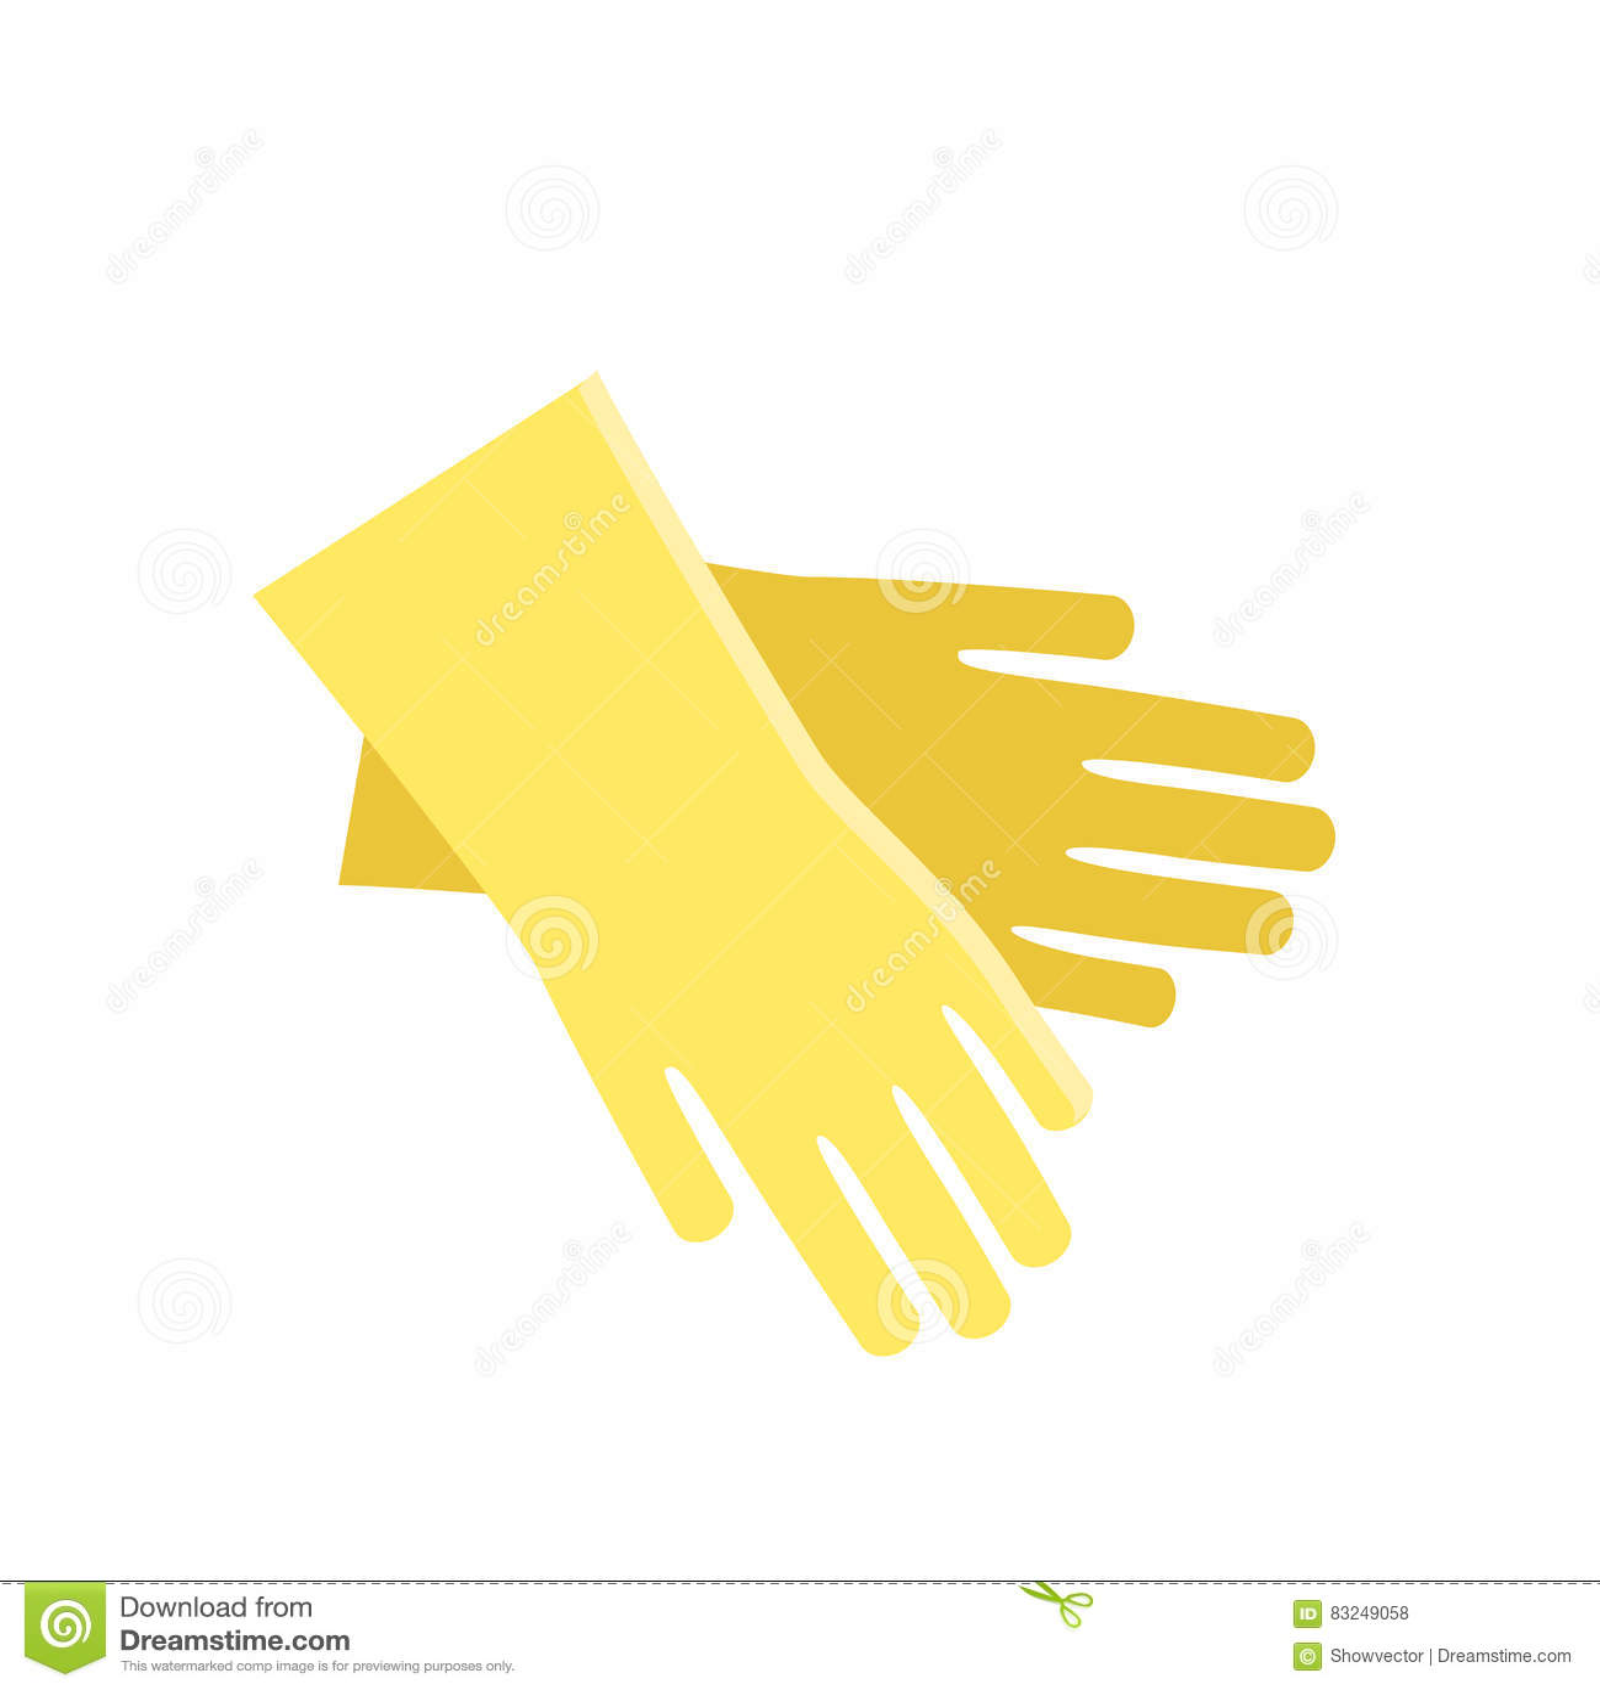 Rubber glove hand jobs down loads-7877